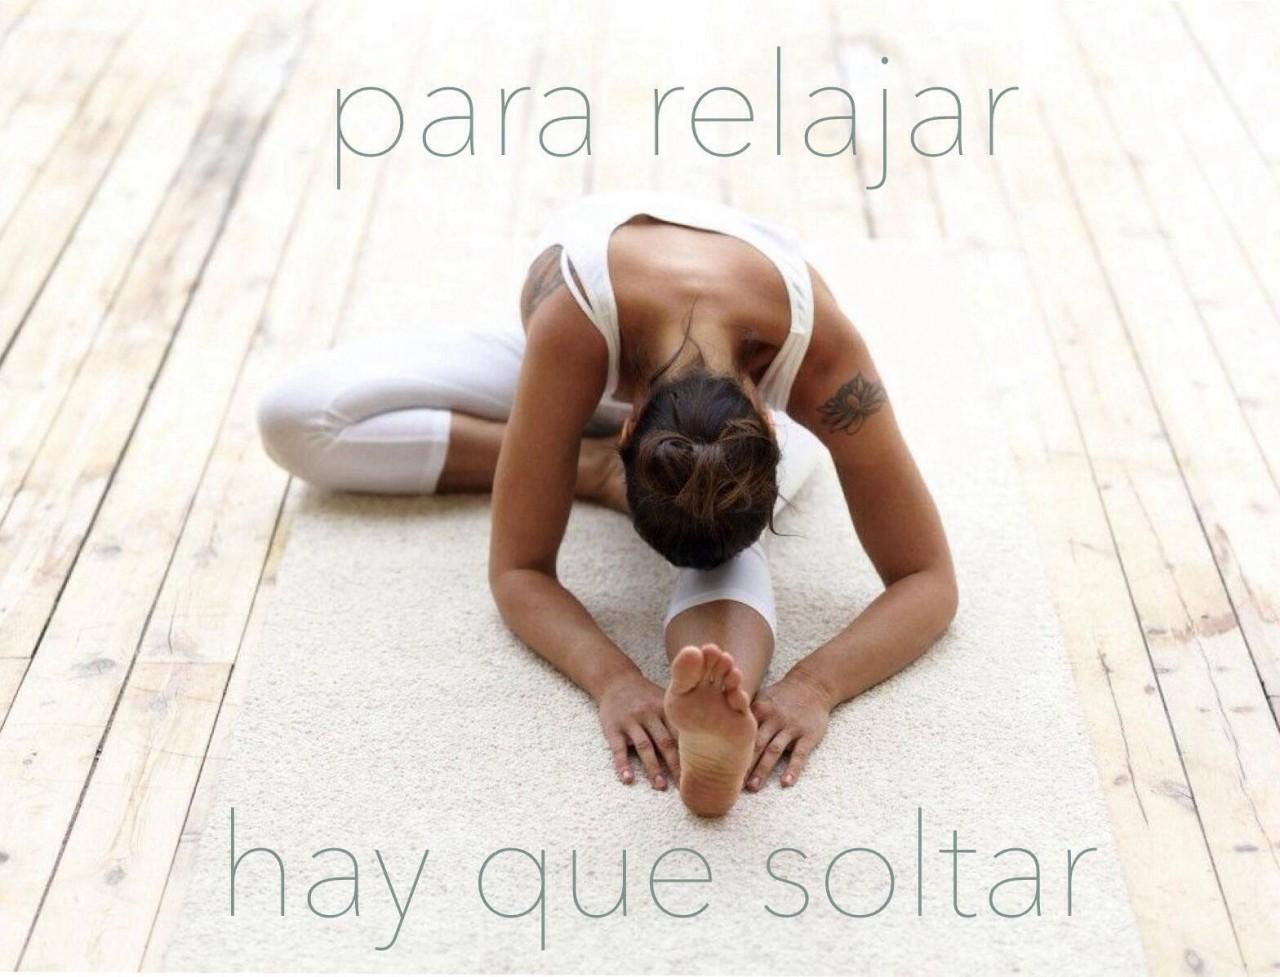 6 Frases que te delatan como YOGUI - Asociación de Instructores de Yoga  Latinoamérica